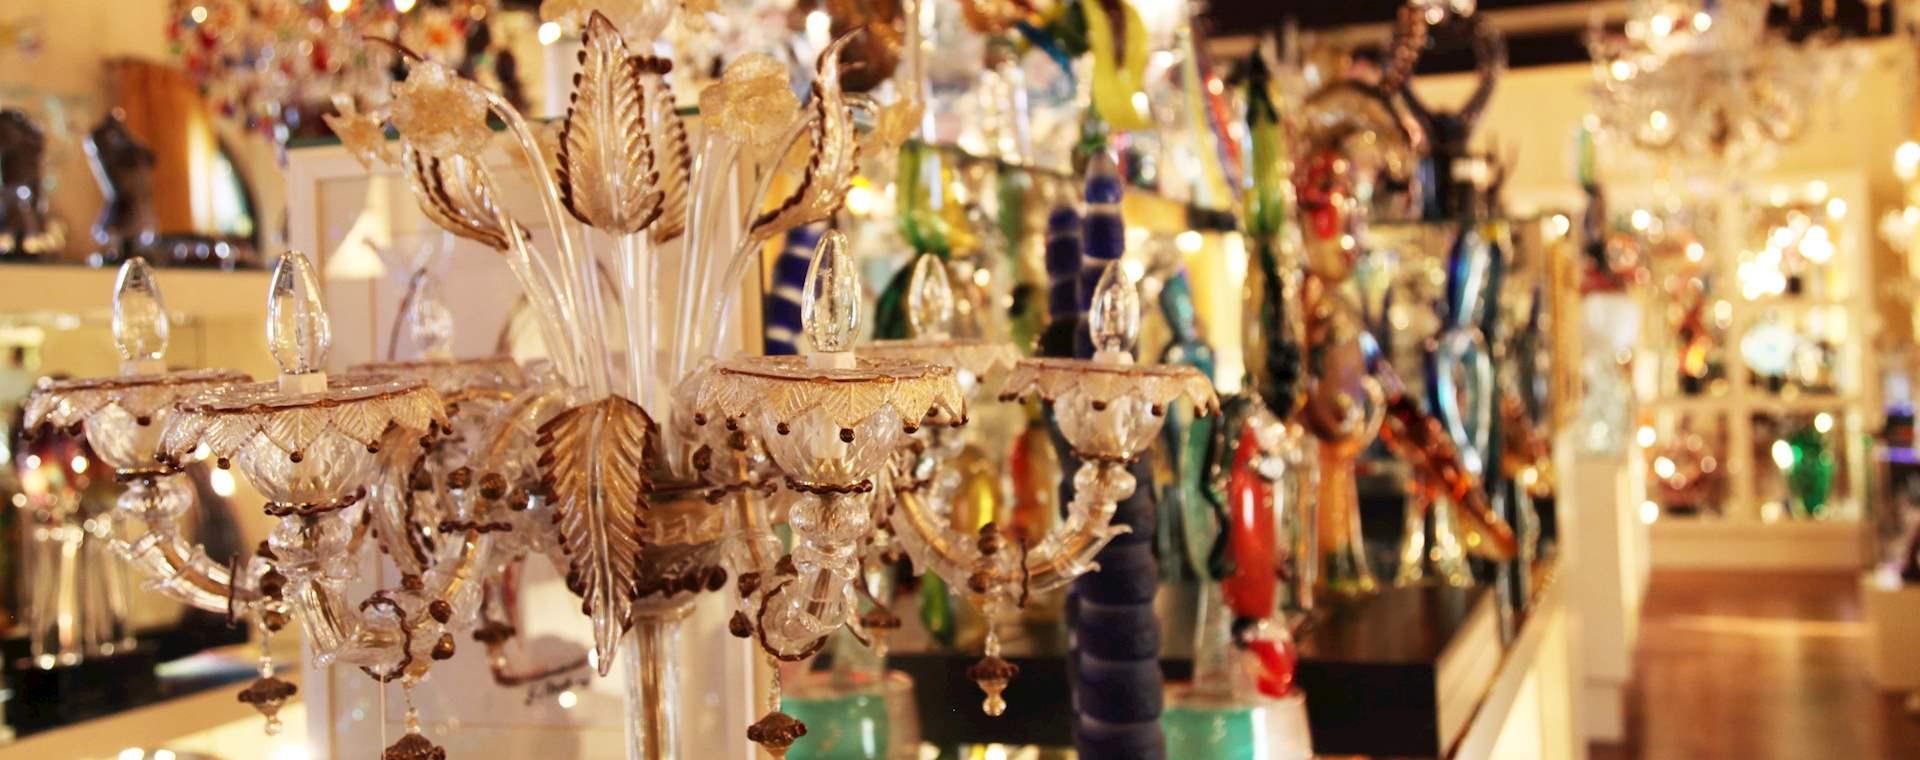 Private Venetian Island Tour: Murano Glassblowing & Burano Lacemaking